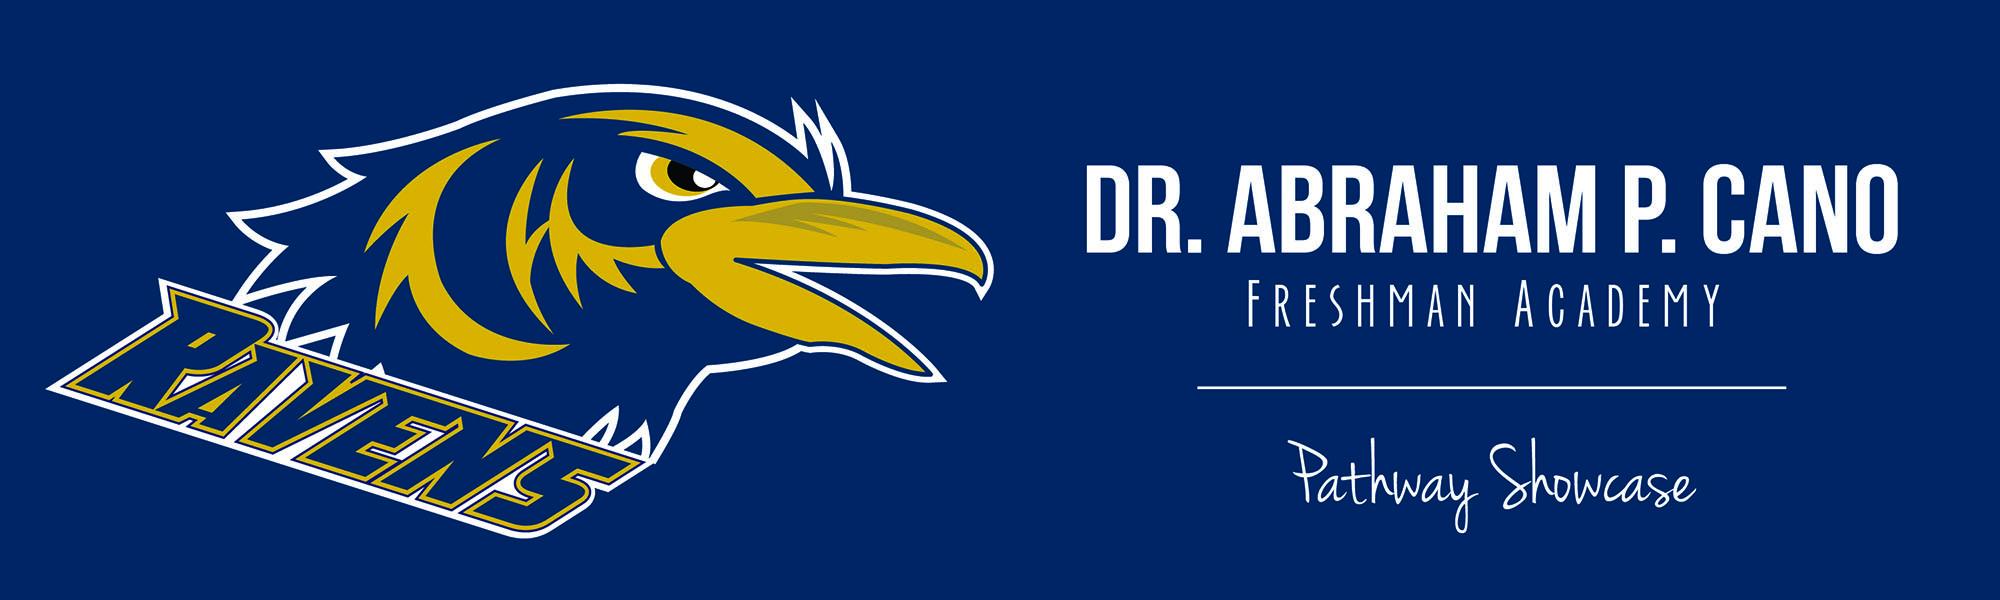 Dr. Abraham P. Cano Freshman Academy Pathway Showcase 2014